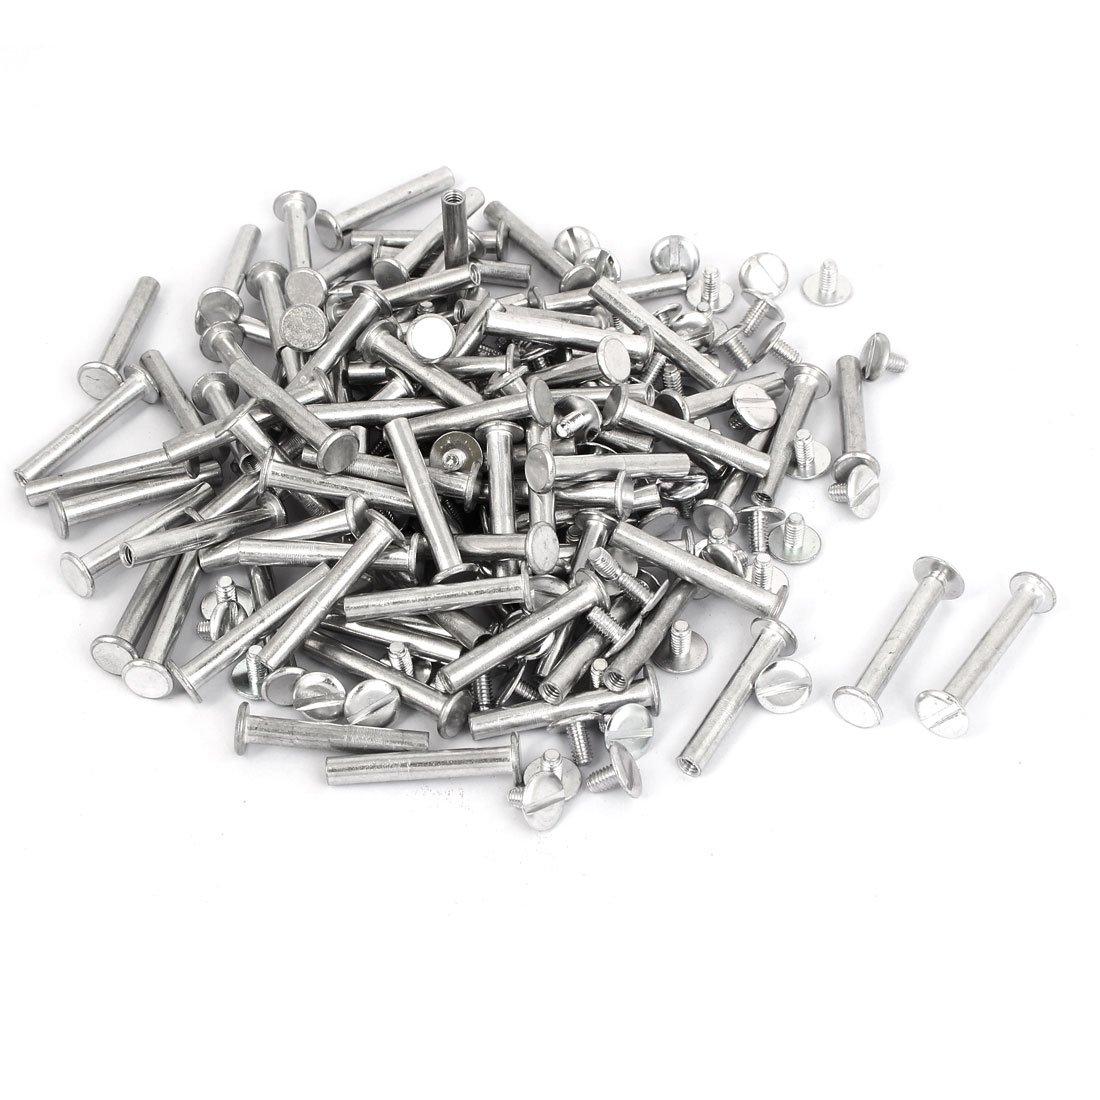 uxcell M5x32mm Aluminum Binding Screw Post 100pcs for Photo Albums Scrapbook